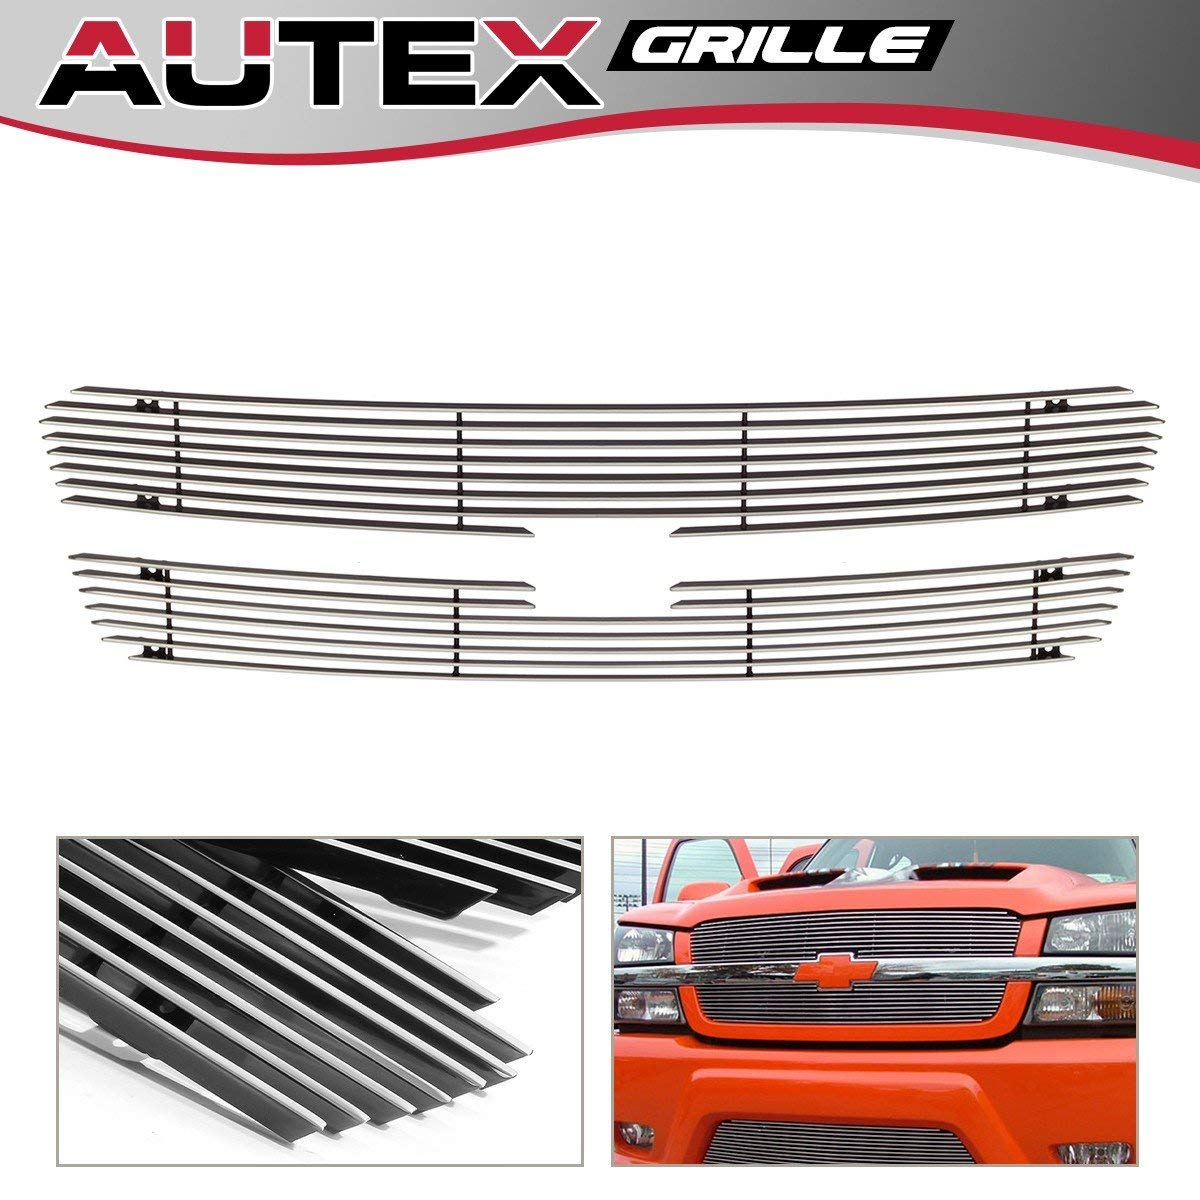 AUTEX 2x Upper Aluminum Billet Grille Insert C65717A Compatible With 2003-2005 Chevy Silverado 1500/1500 SS/1500 HD, 2003-2004 Silverado 2500/3500/2500 HD, 2002-2006 Chevy Avalanche 1500/2500